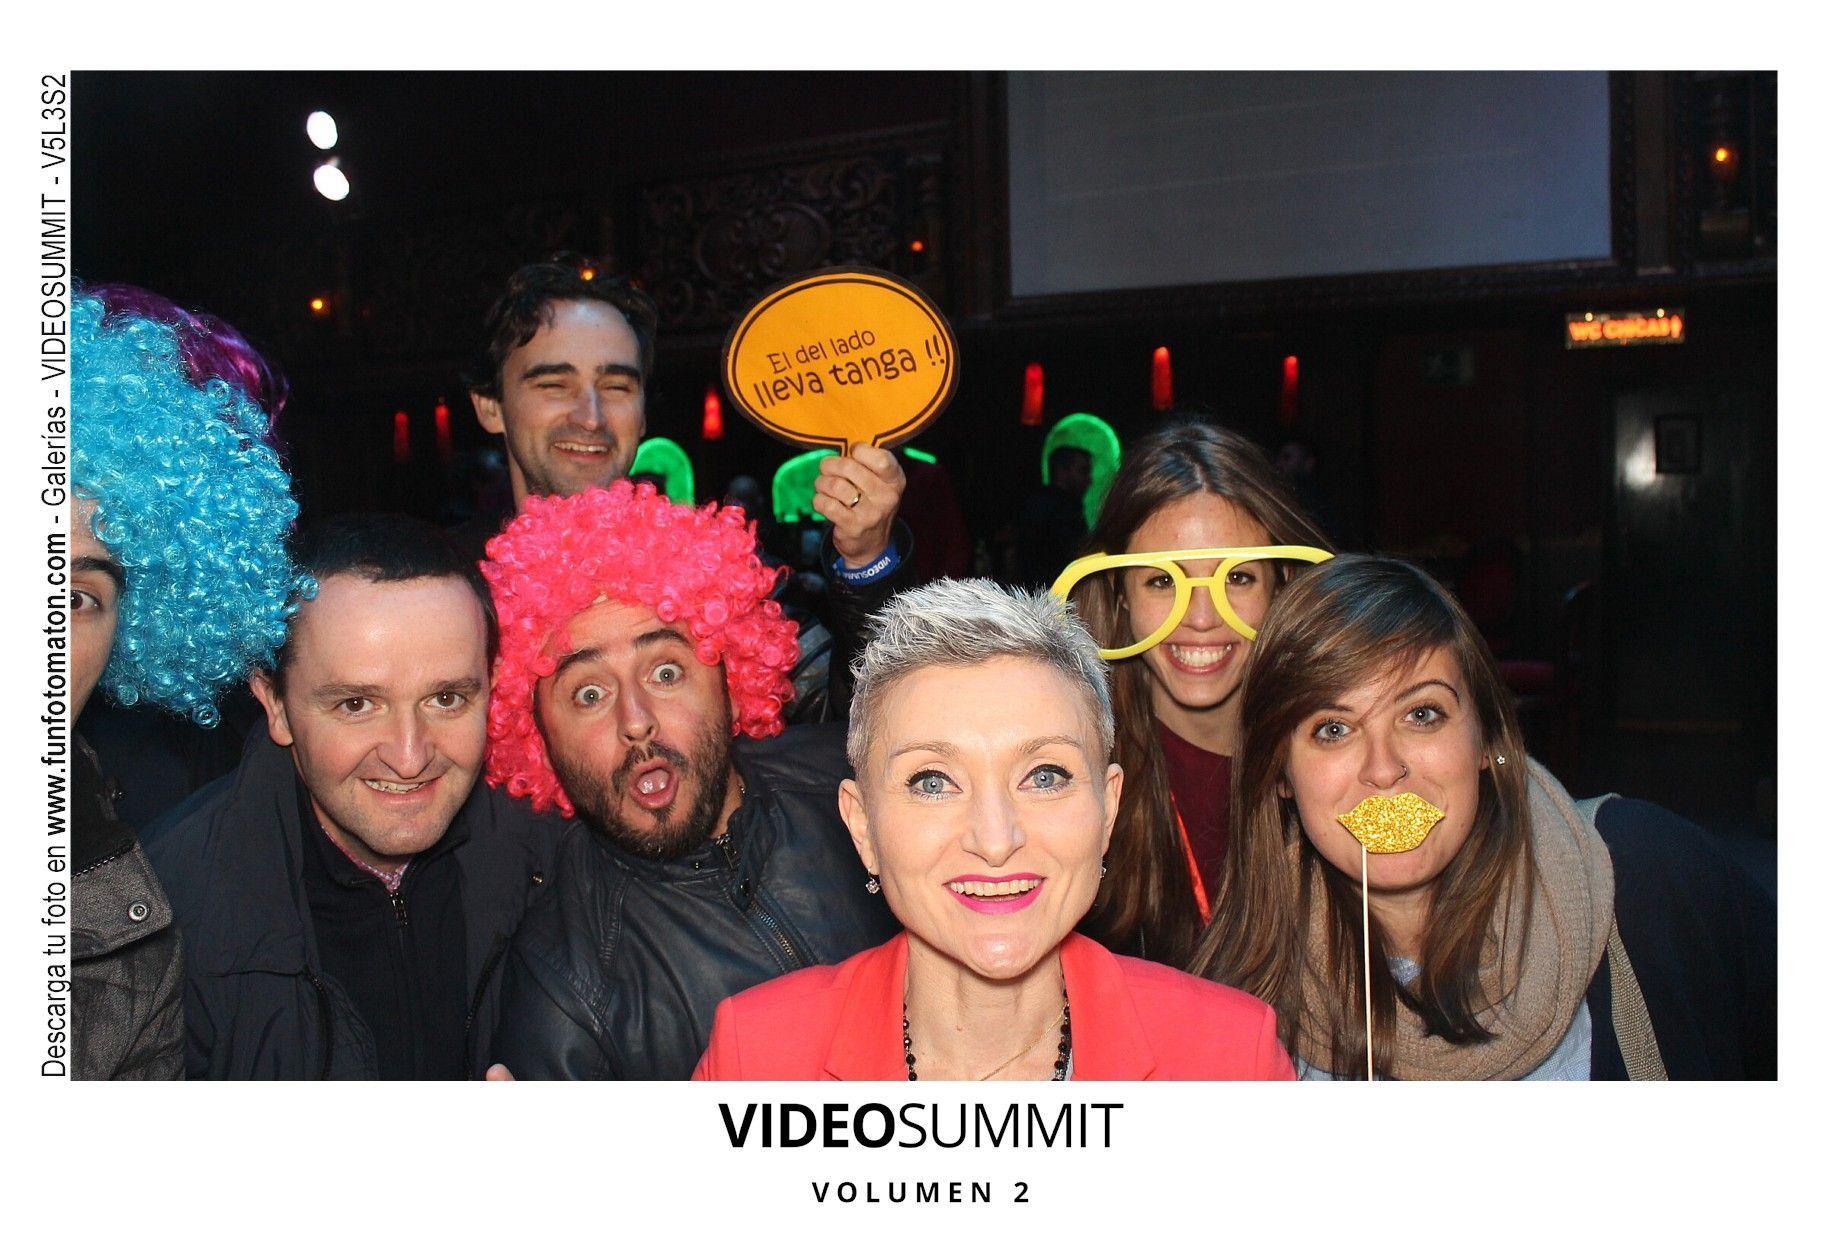 videosummit-vol2-club-party-073